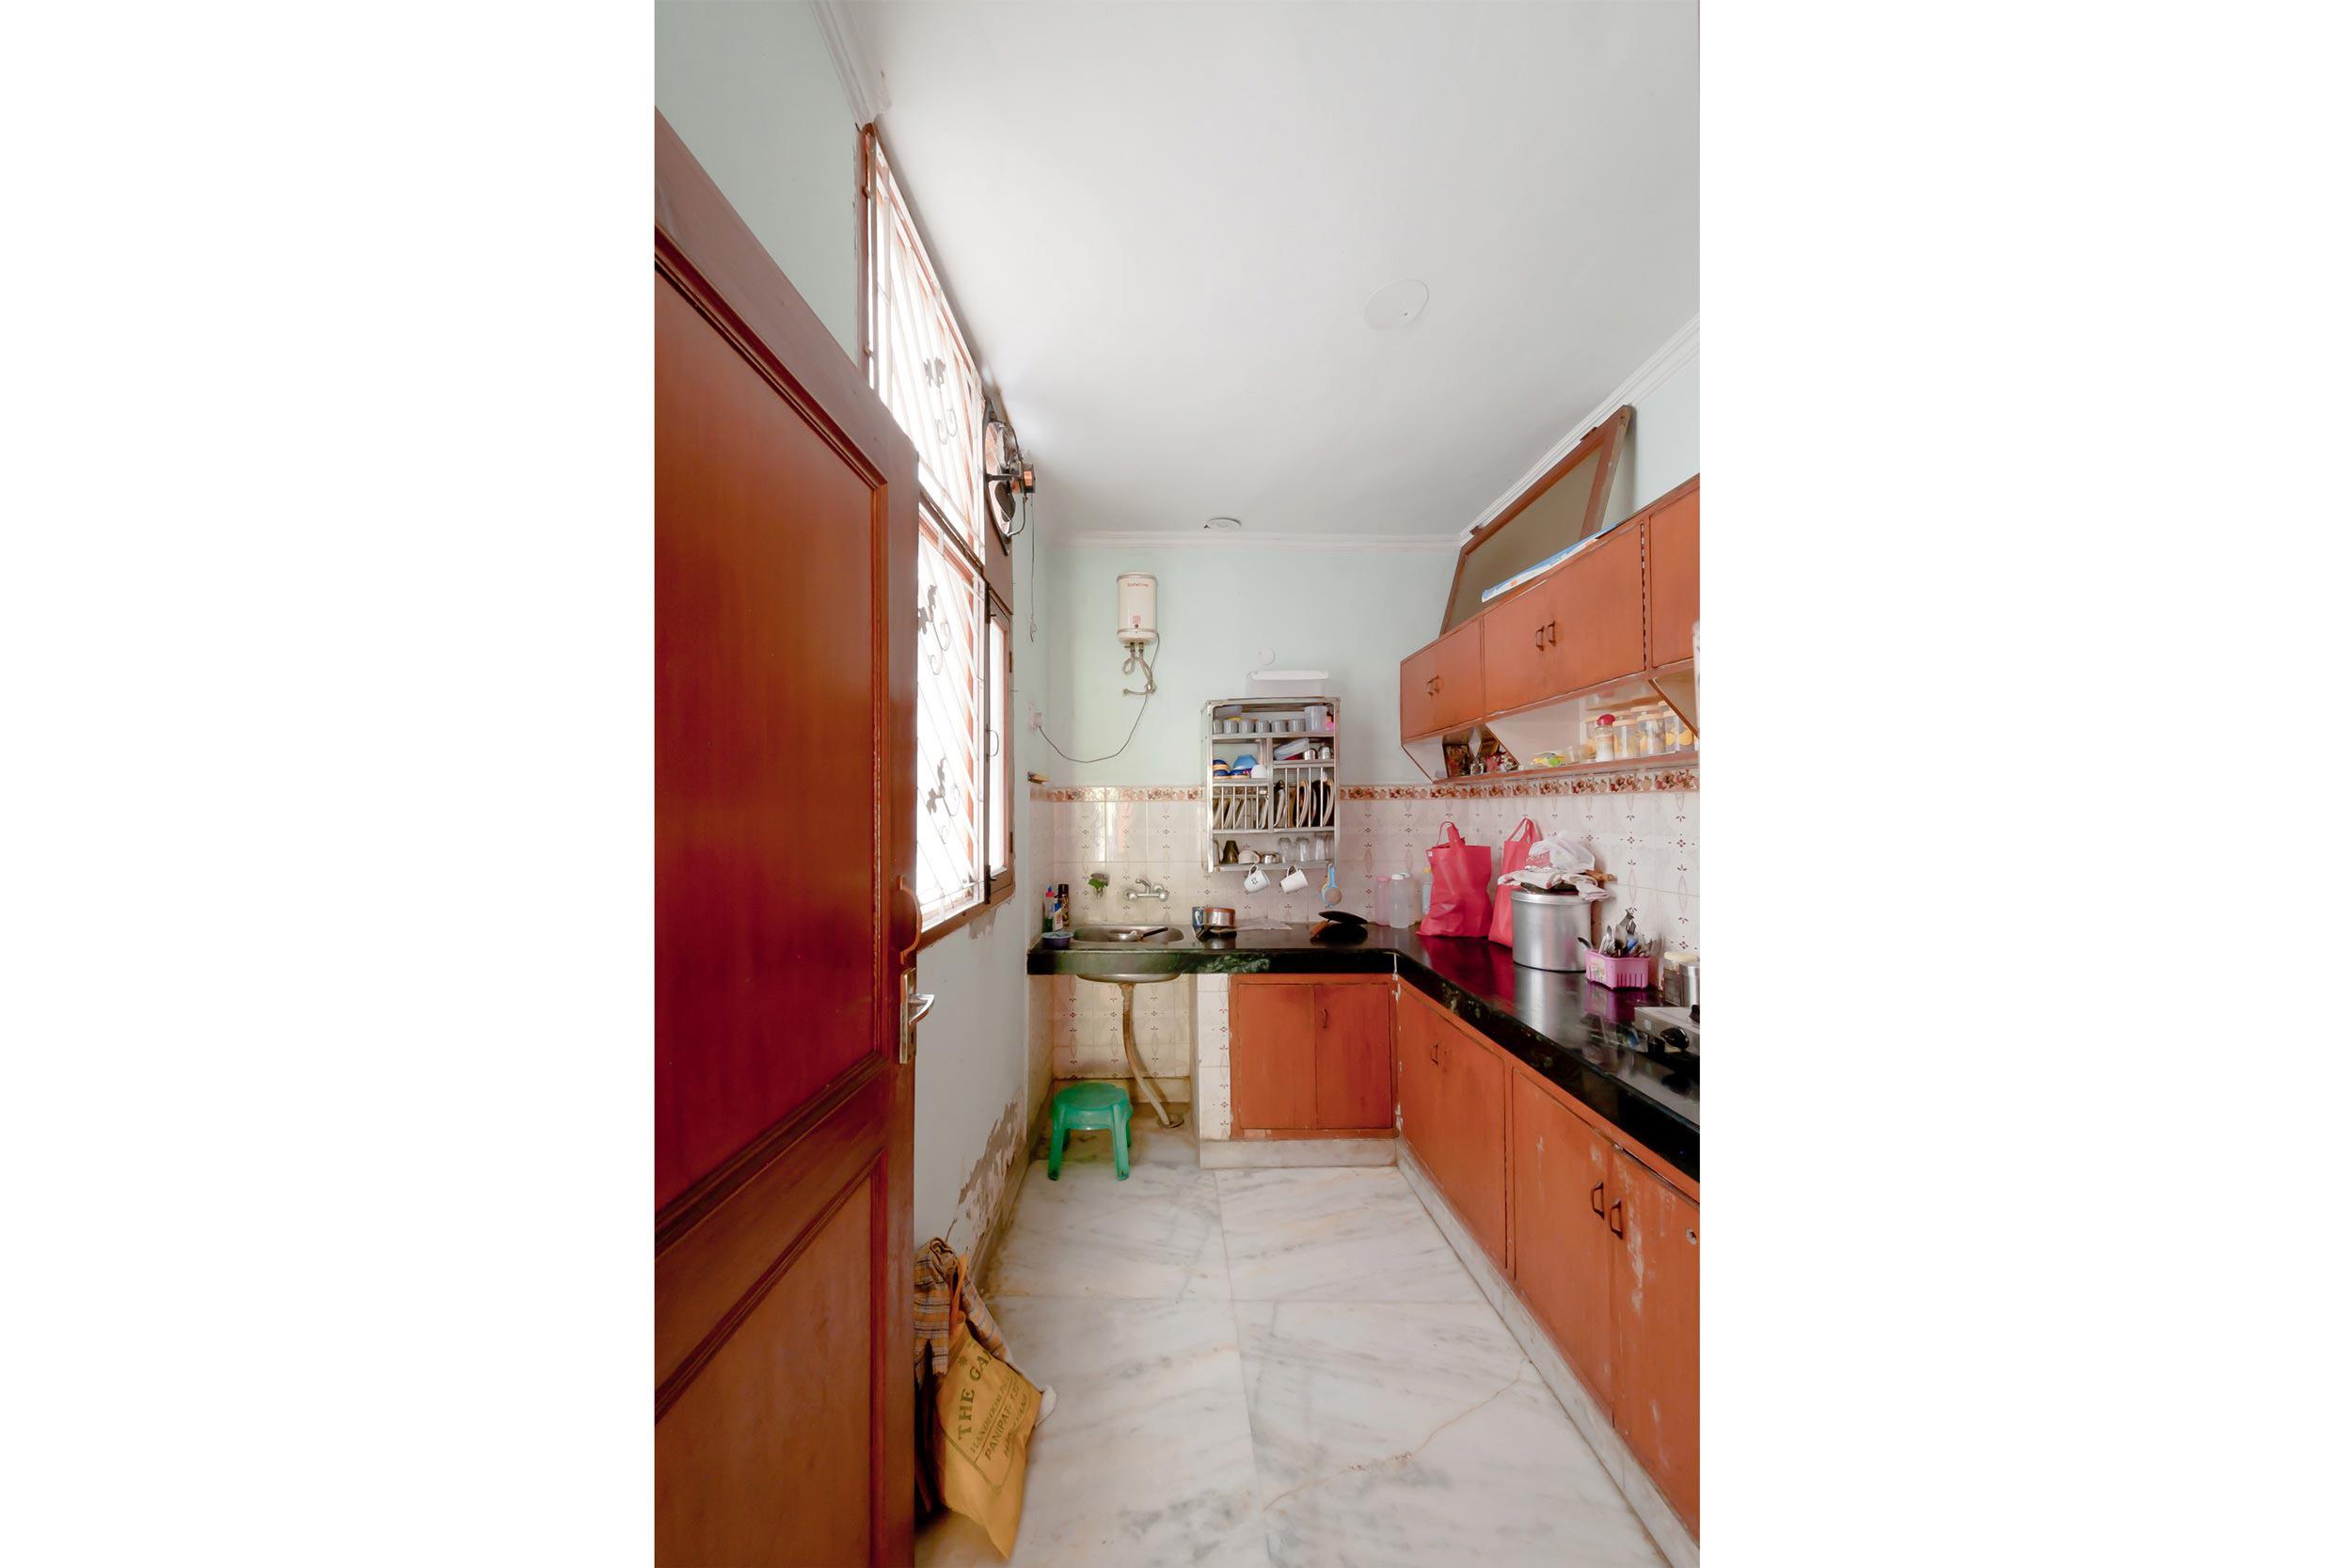 FUW_the-indian-middleclass-kitchen_11-sanjam.jpg